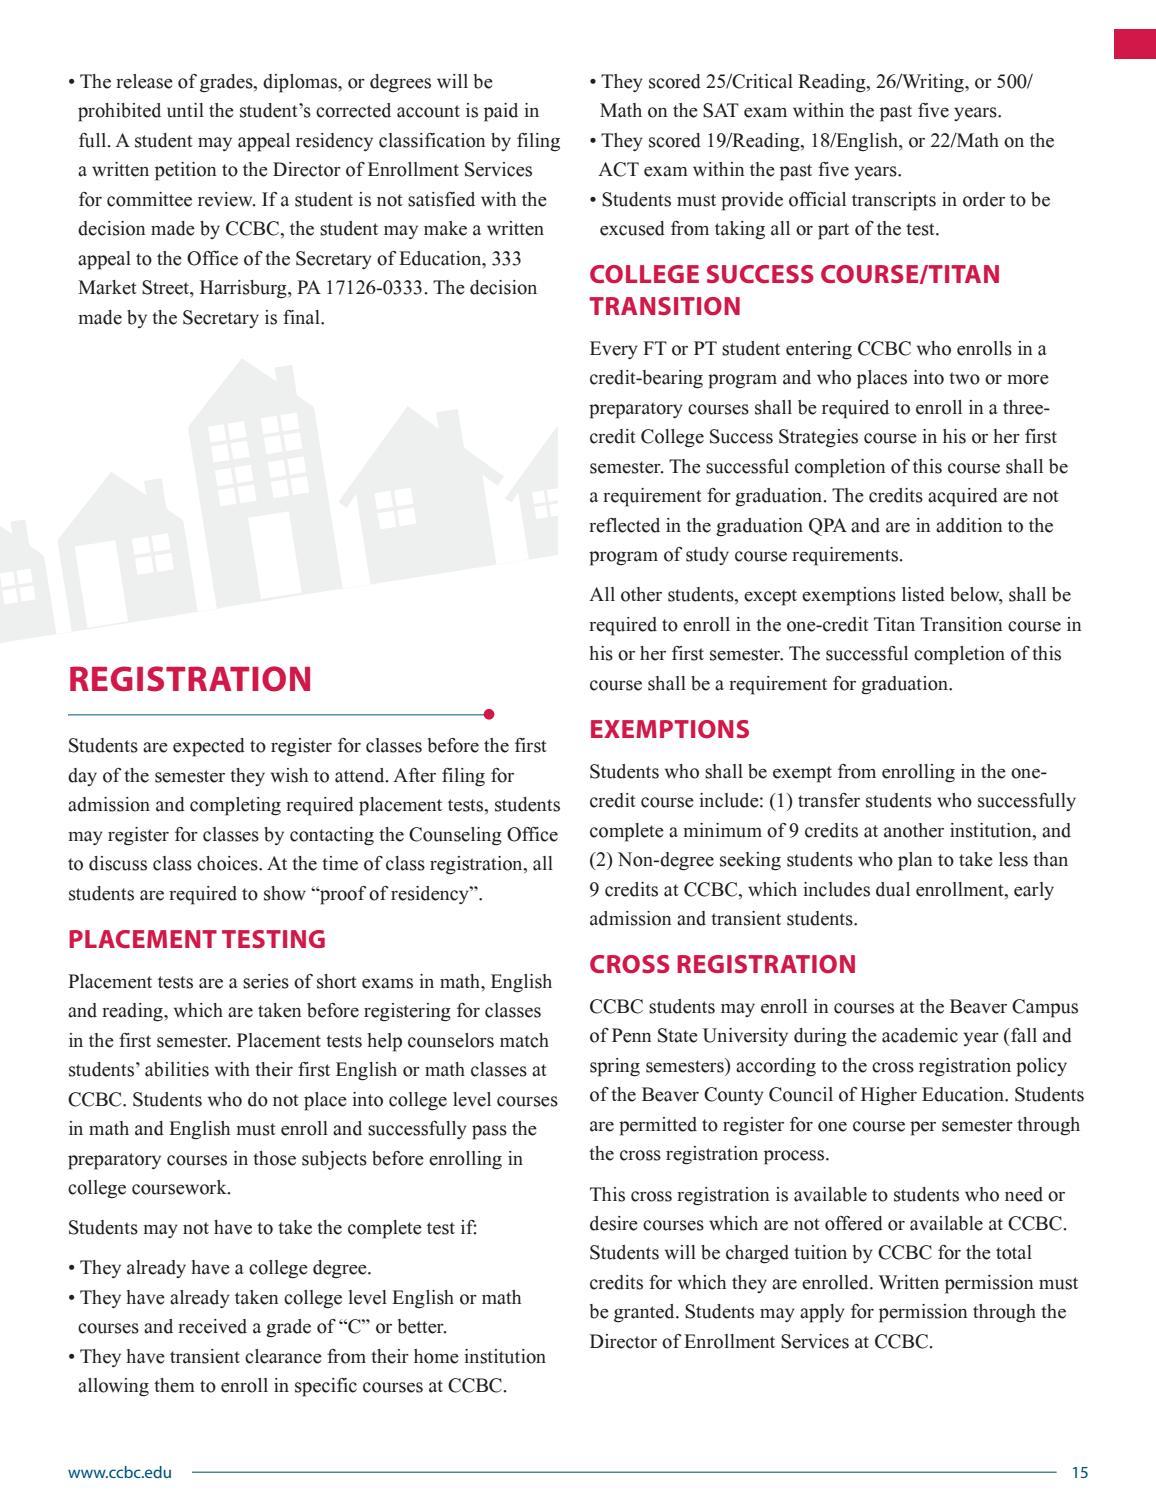 c276359e9b53 Community College of Beaver County 2016-17 Academic Catalog by Community  College of Beaver County - issuu